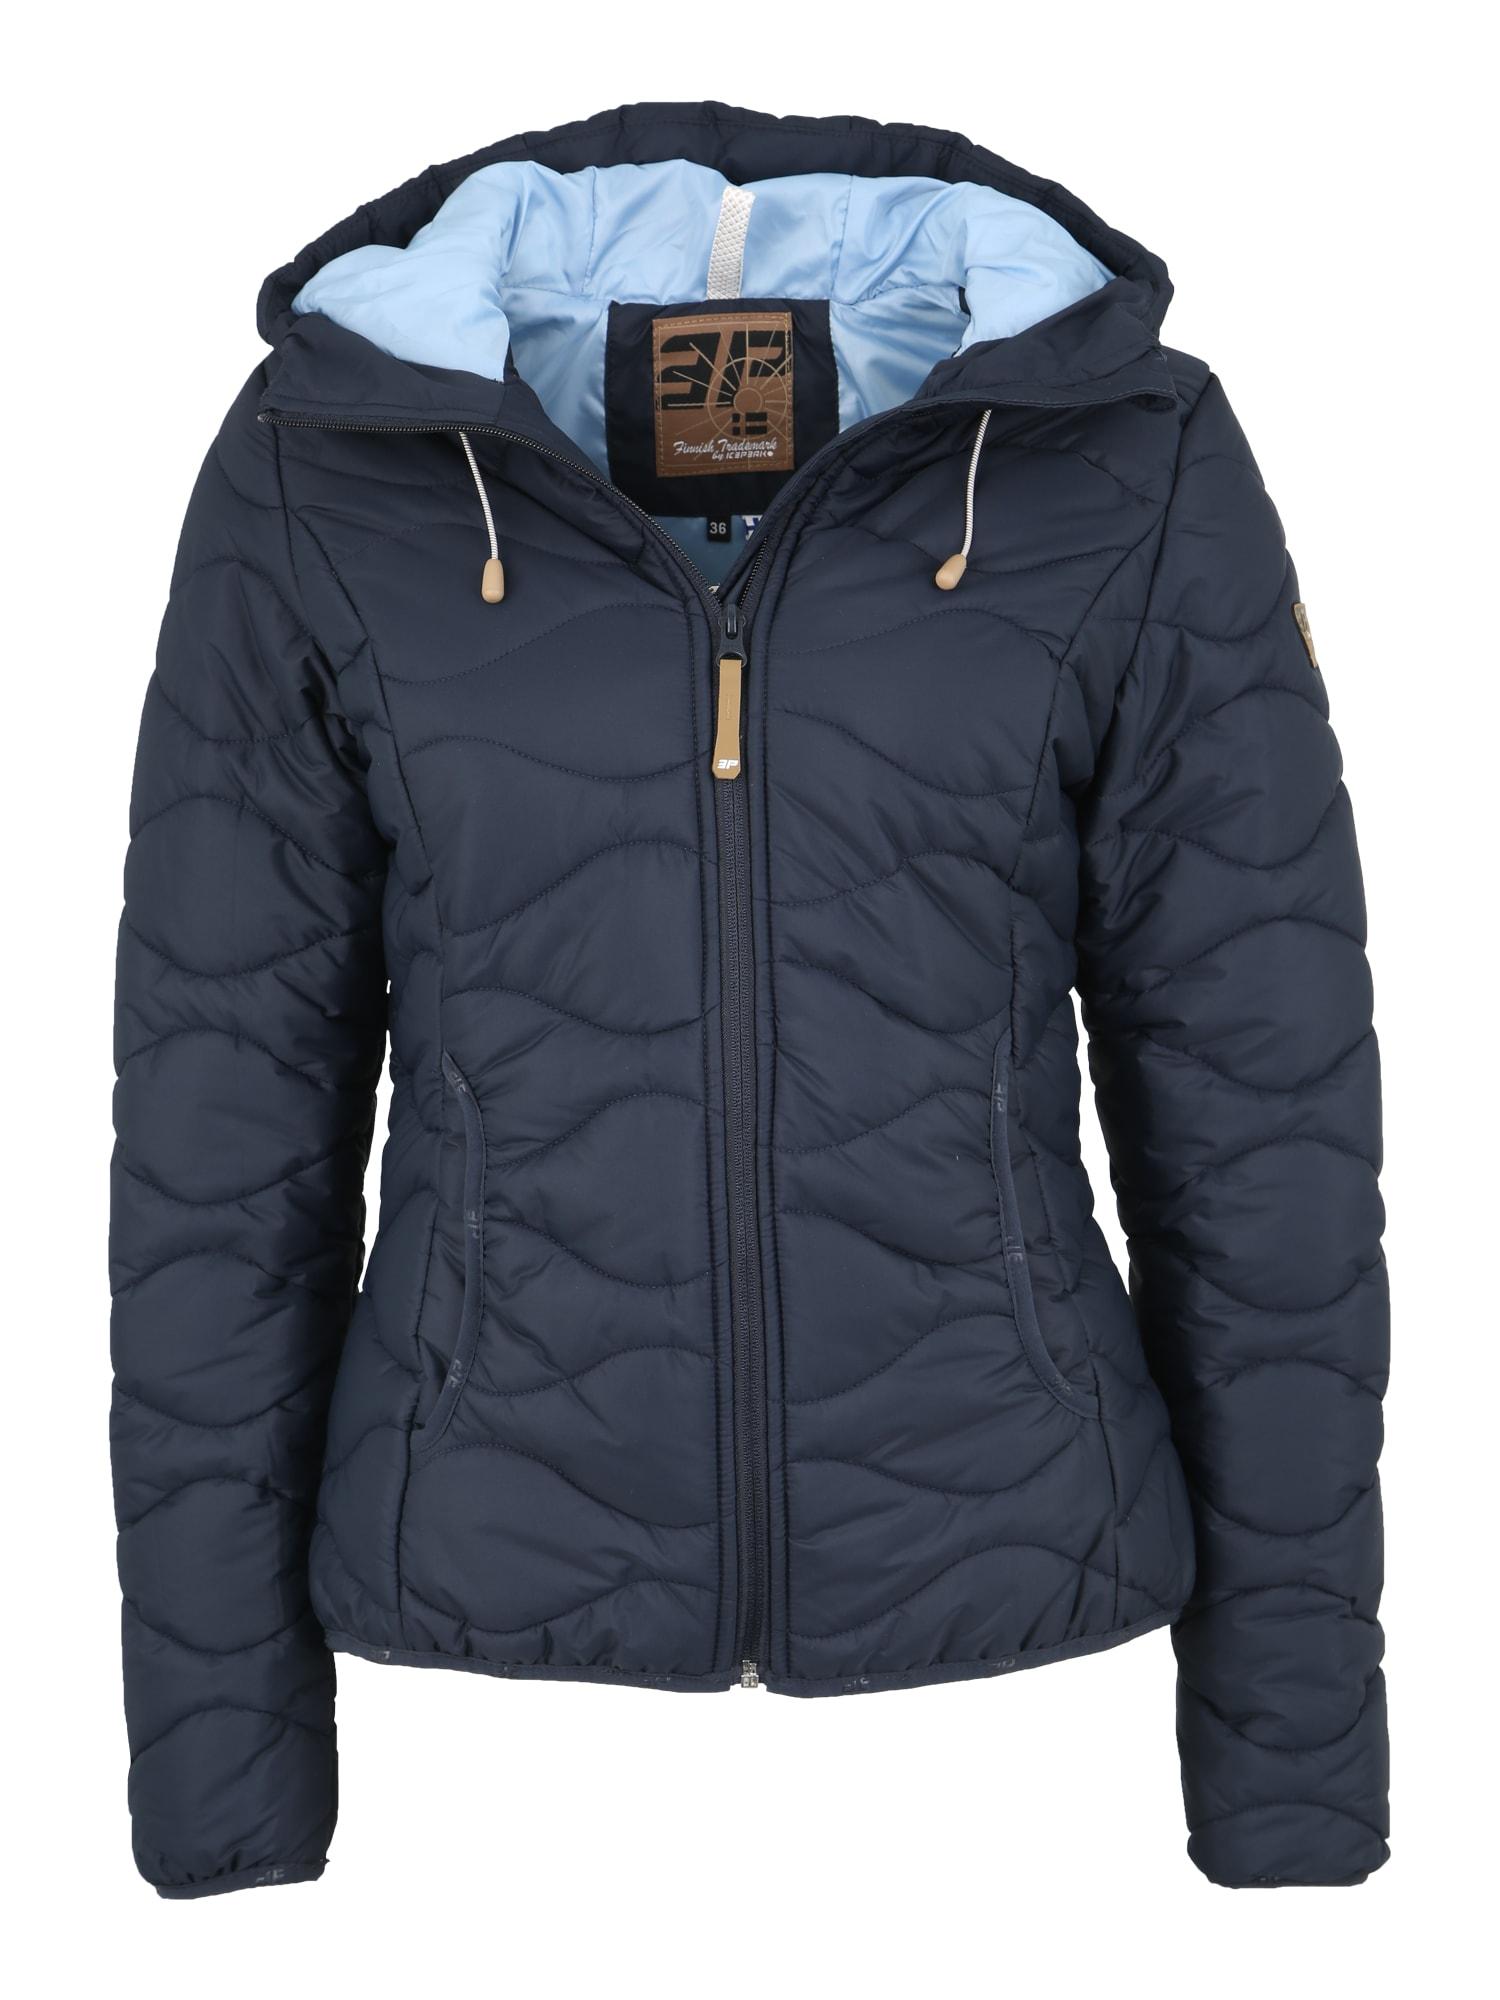 Outdoorová bunda TAIKA tmavě modrá ICEPEAK